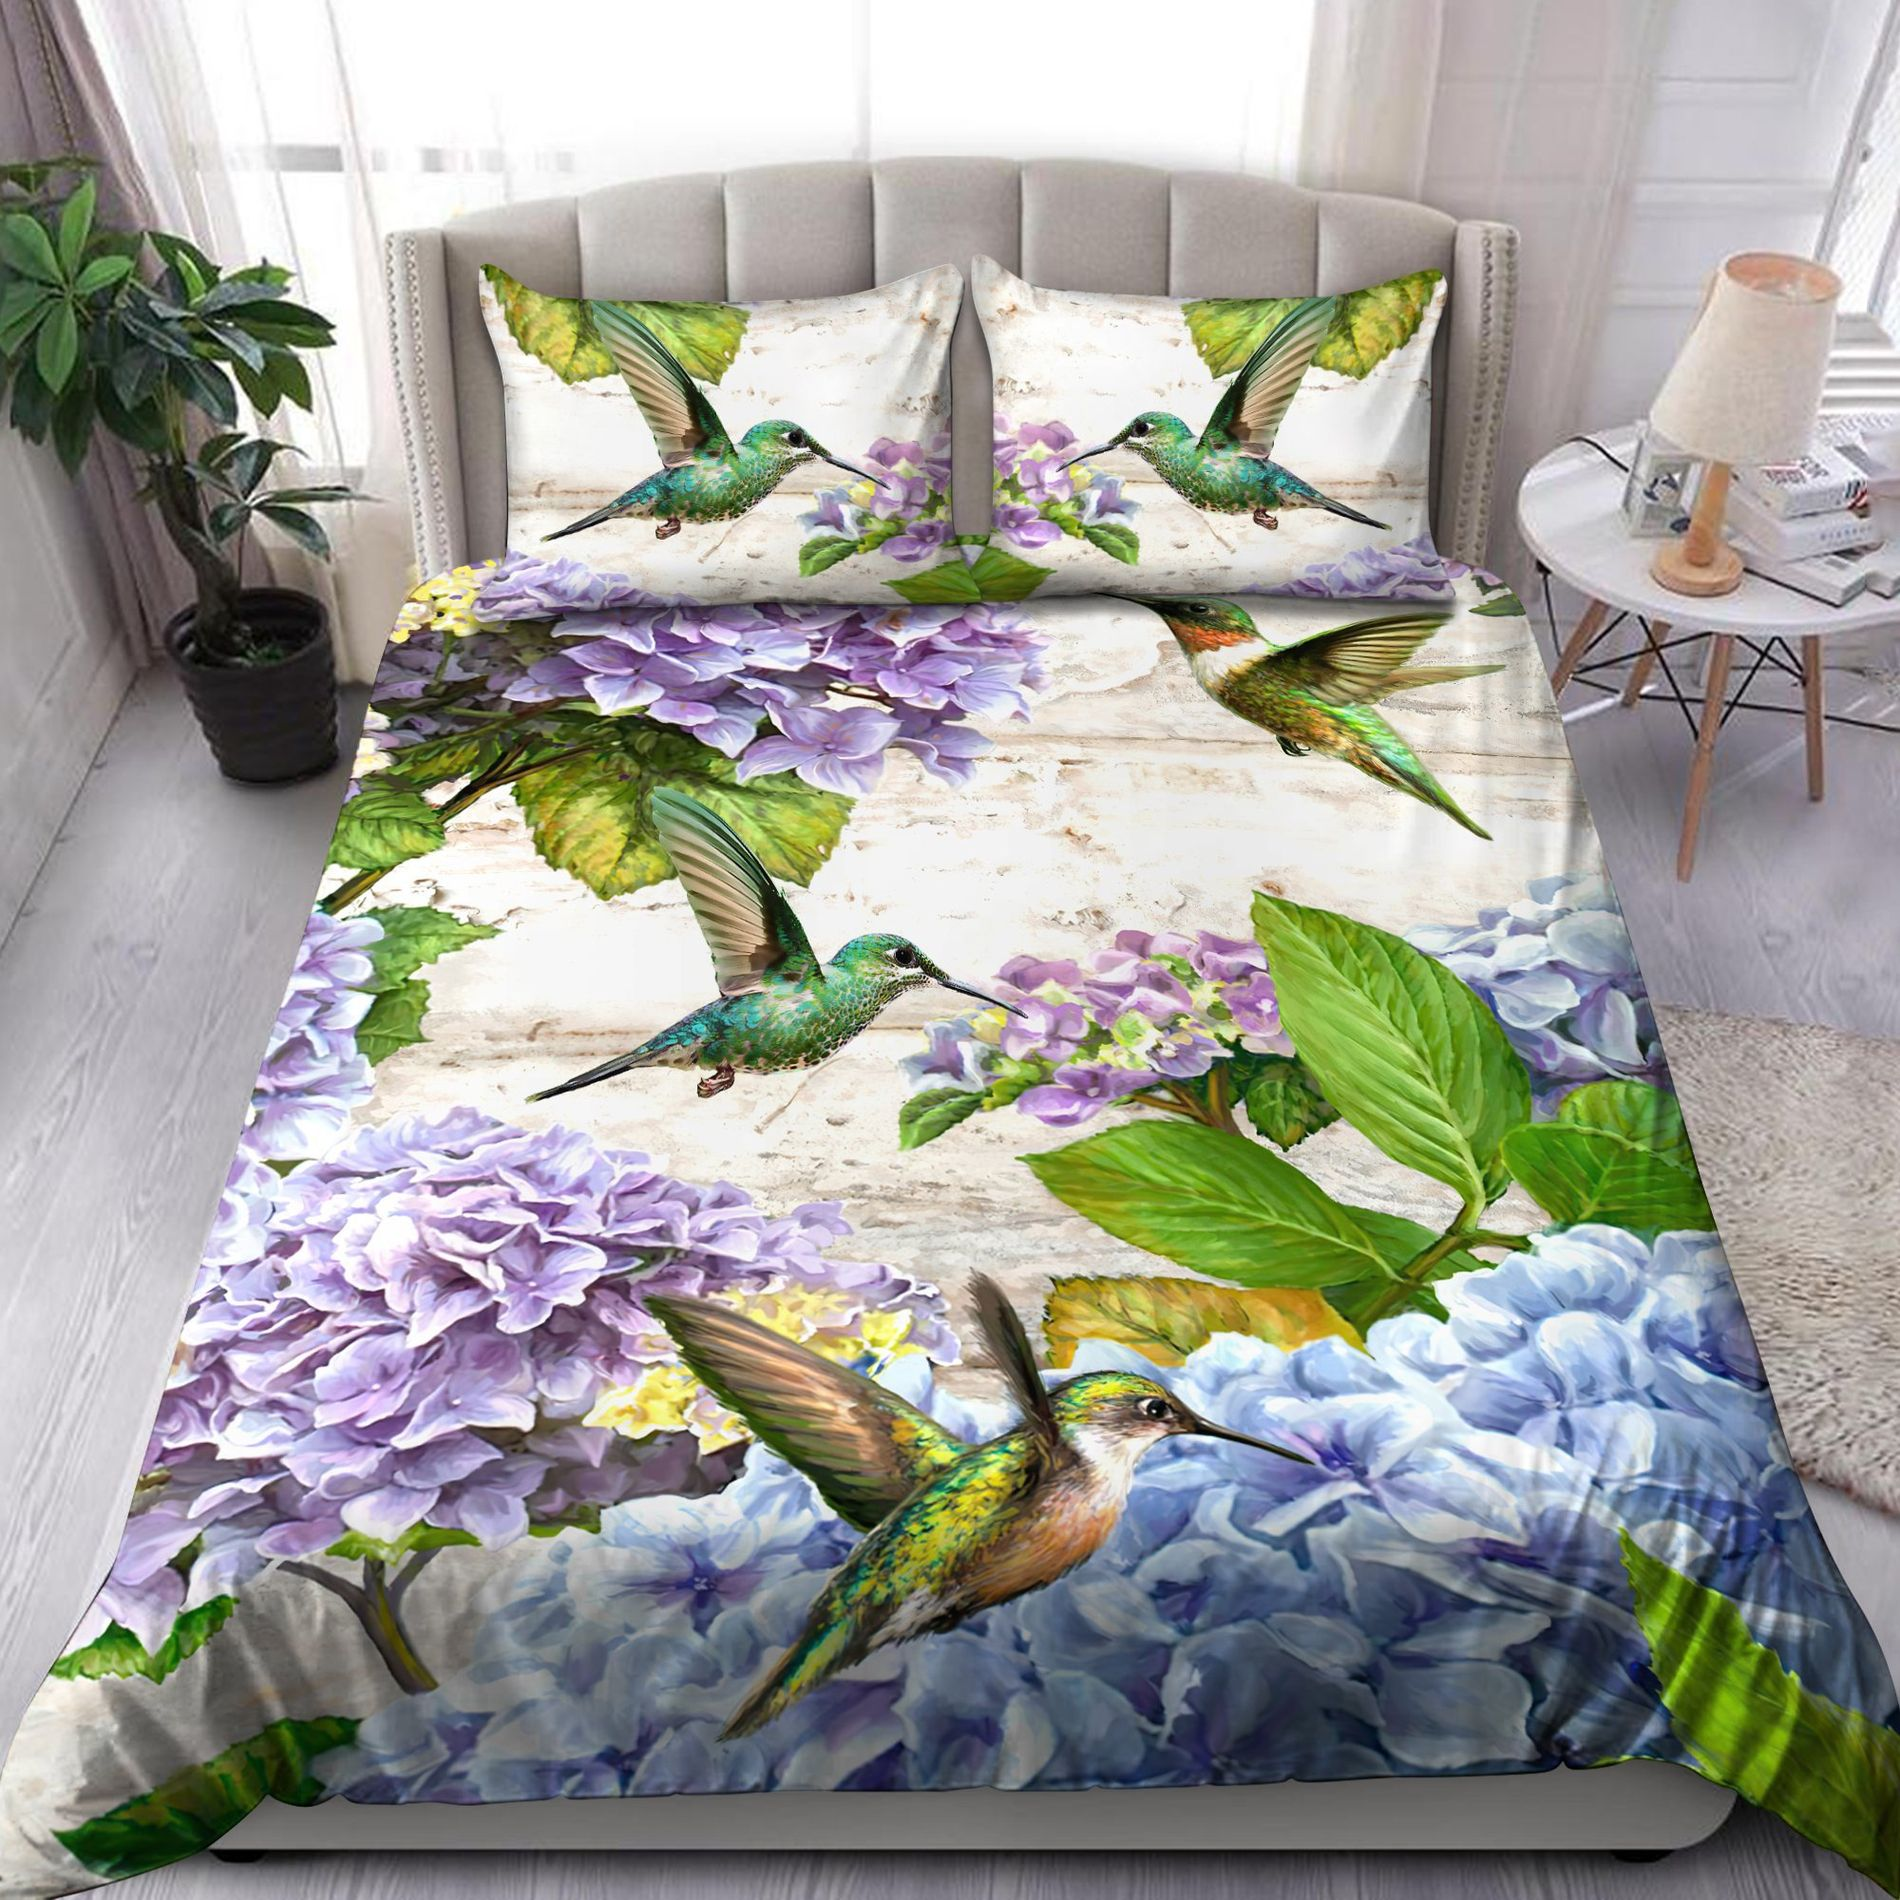 Flower & bird bedding sets with full range of size